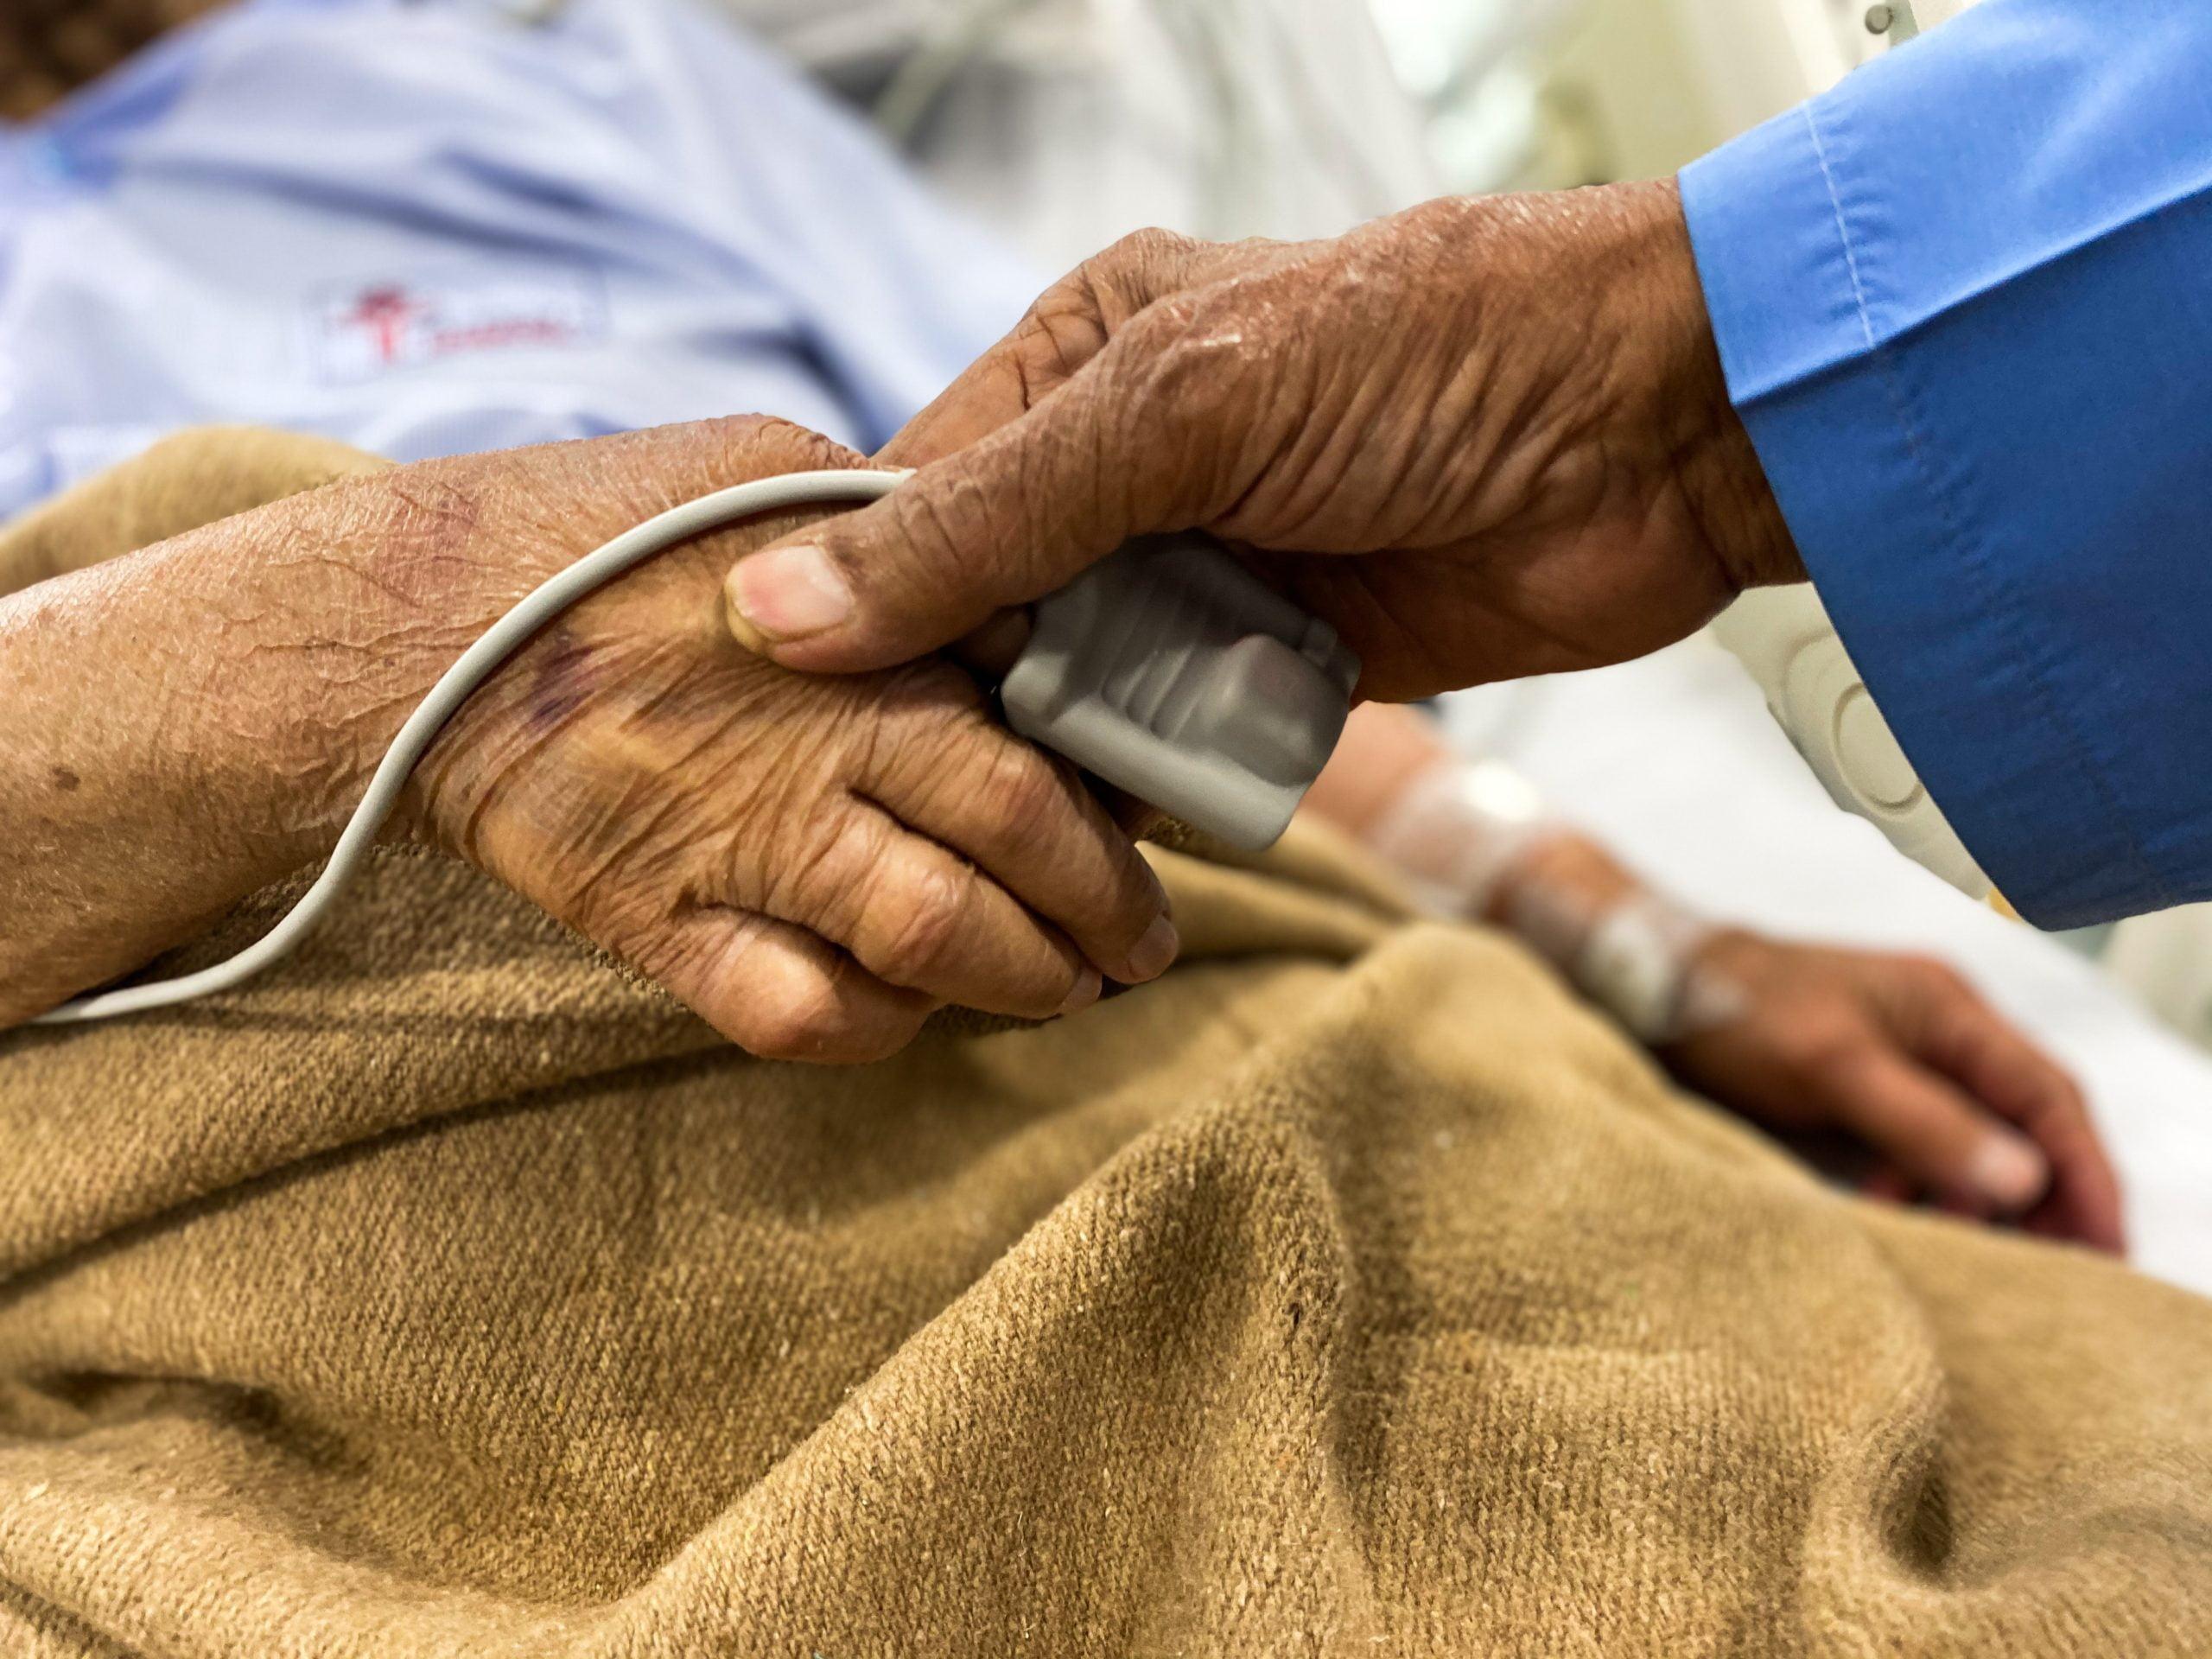 best medical alert systems for elderly